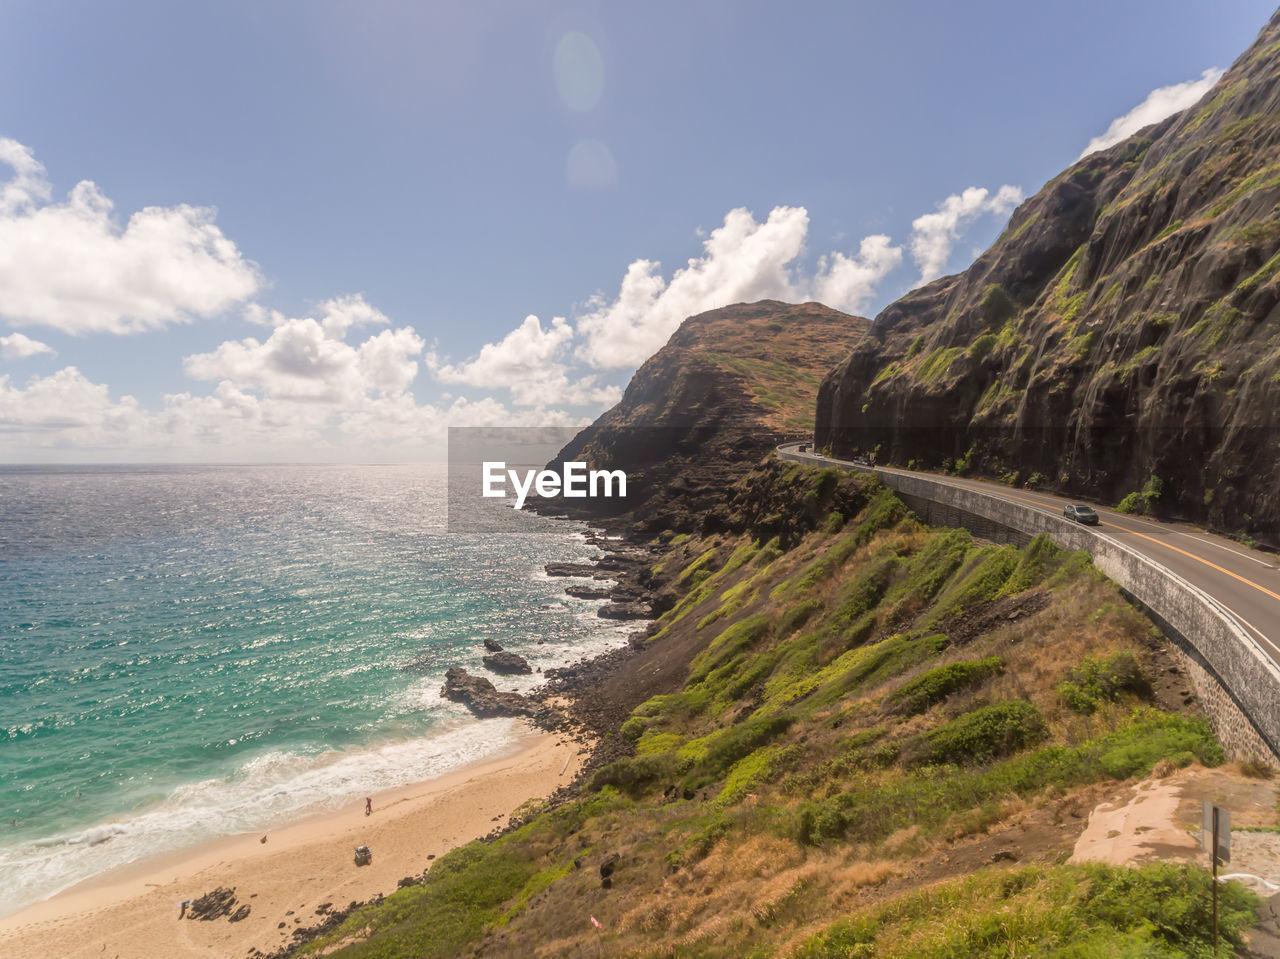 sky, sea, water, beach, cloud - sky, land, scenics - nature, beauty in nature, tranquil scene, nature, tranquility, mountain, day, horizon, no people, horizon over water, motion, coastline, road, outdoors